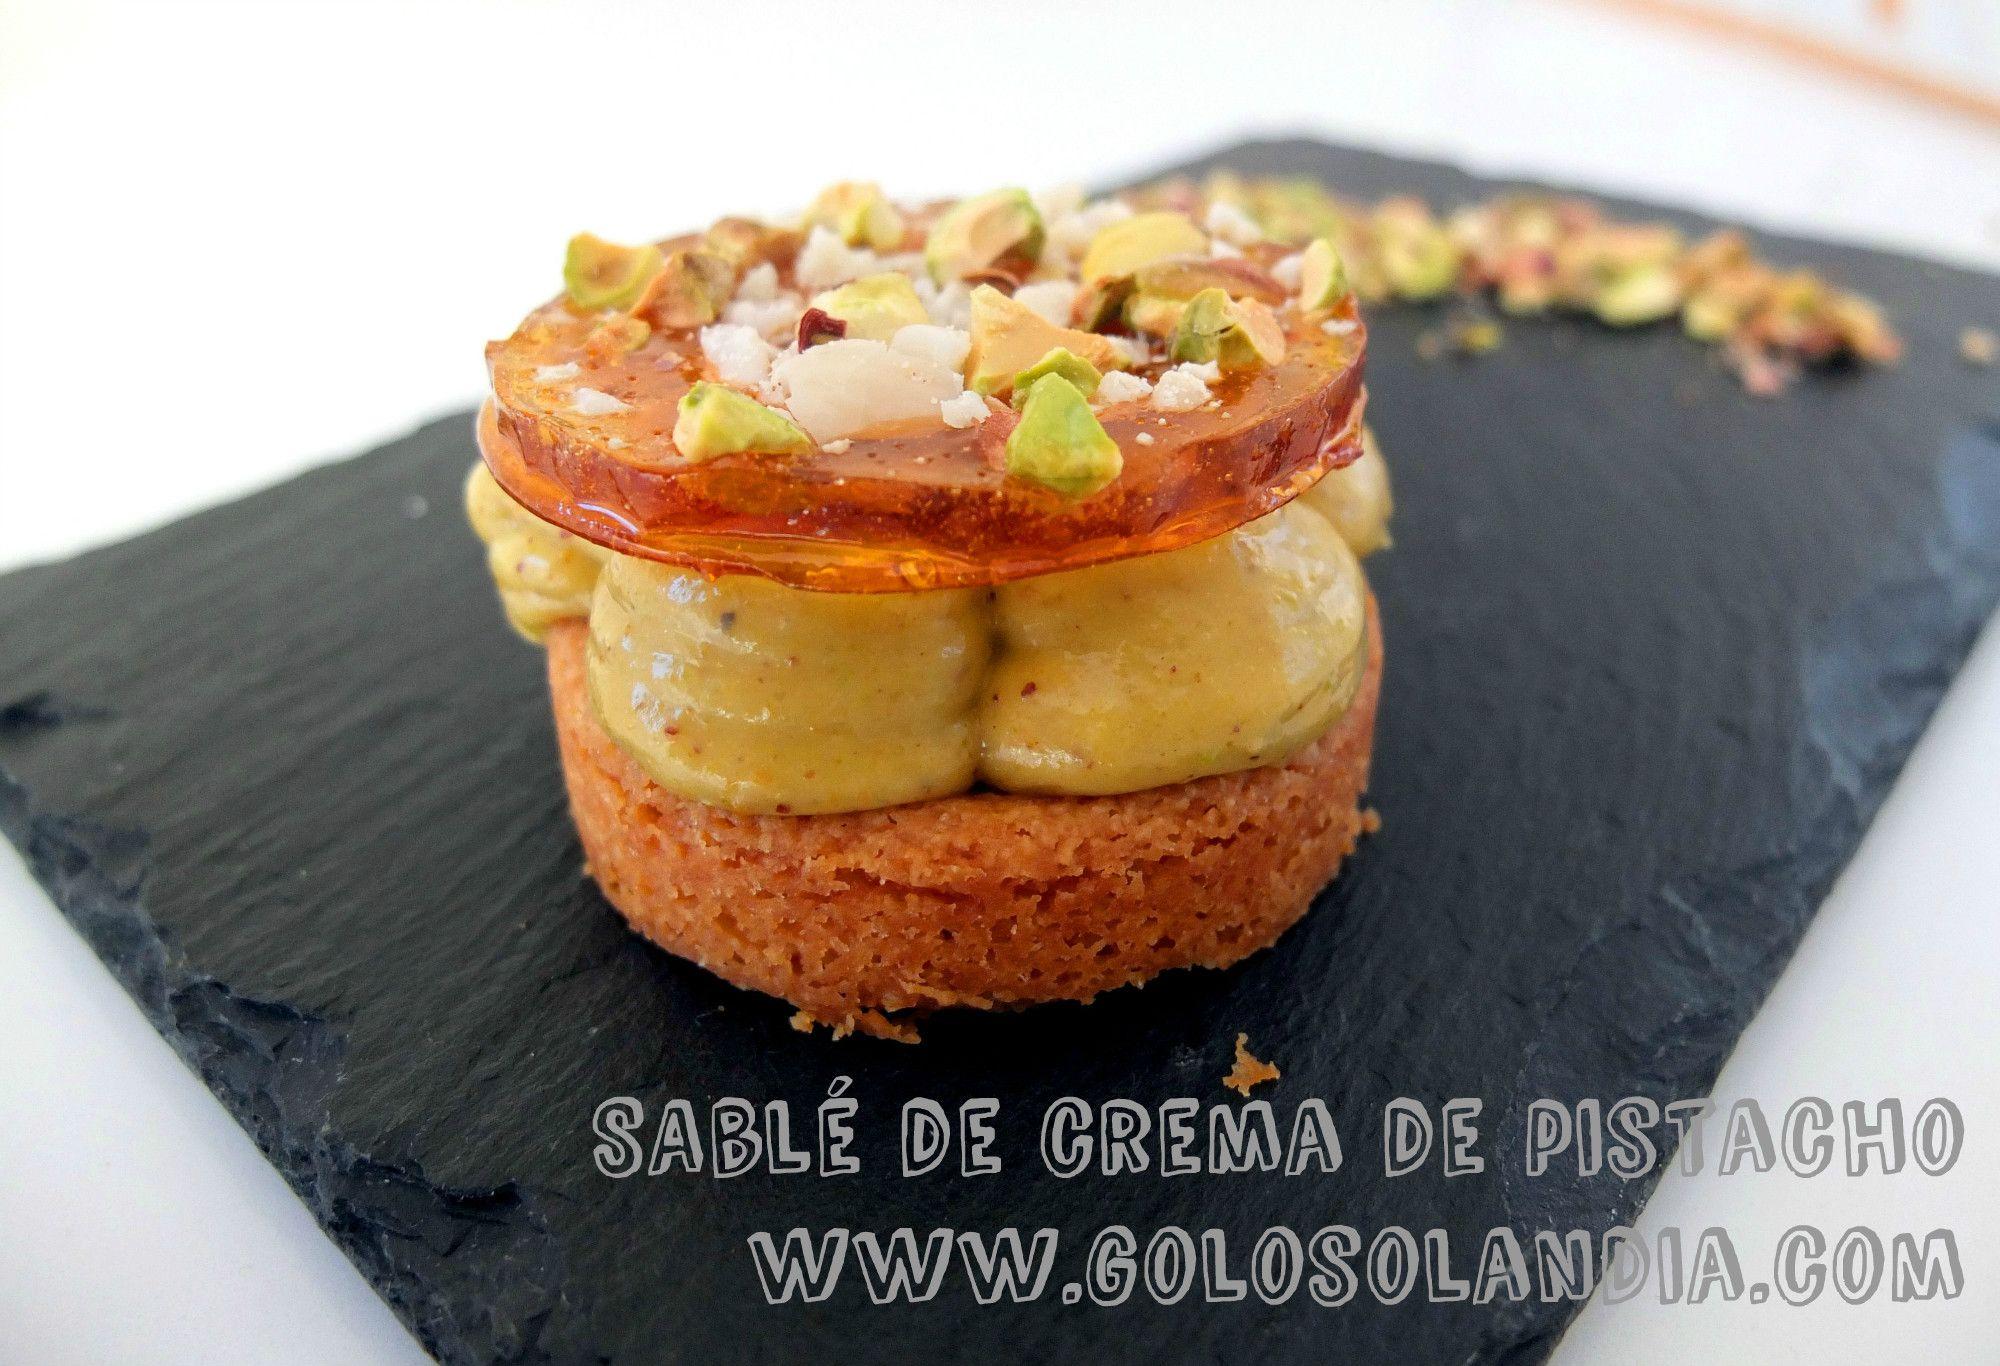 Pedazo de pastelitos: Sablé de crema de pistacho Fácil receta casera, paso a paso.( incluye video )  http://www.golosolandia.com/2015/01/sable-de-crema-de-pistacho.html